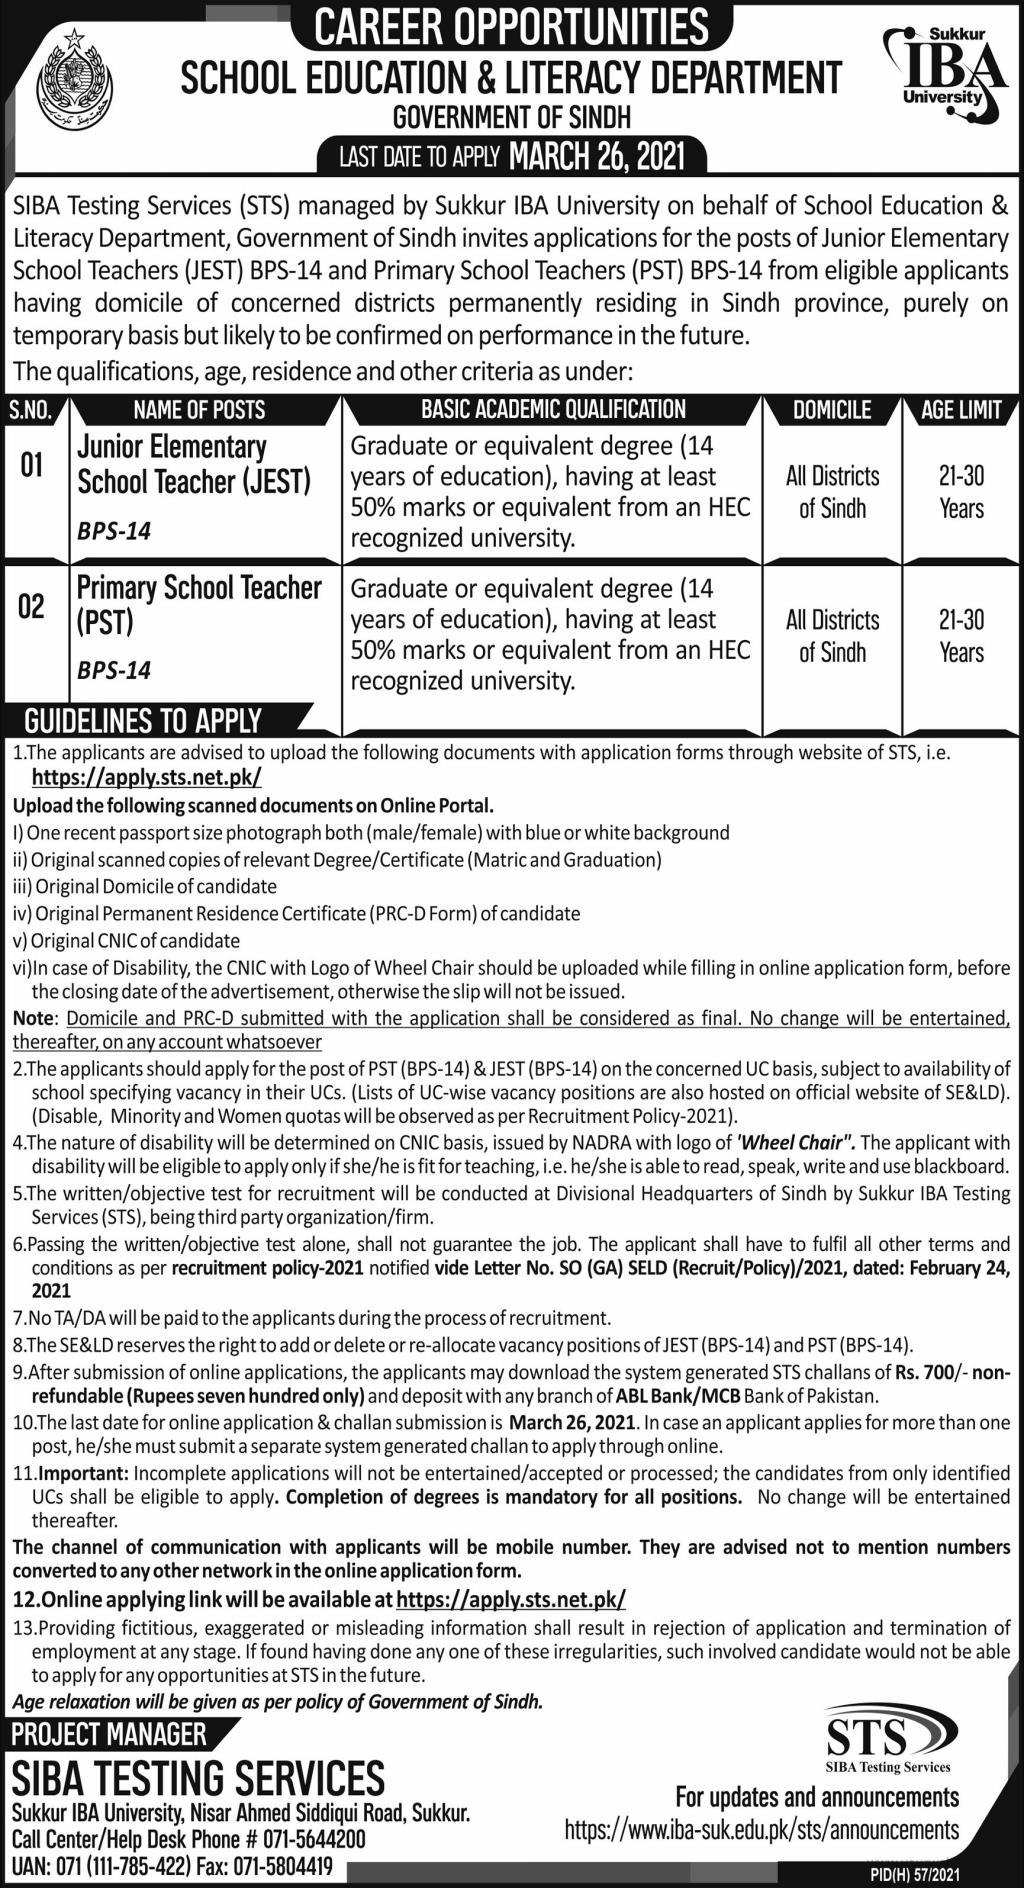 School Education & Literacy Department Jobs 2021 via STS